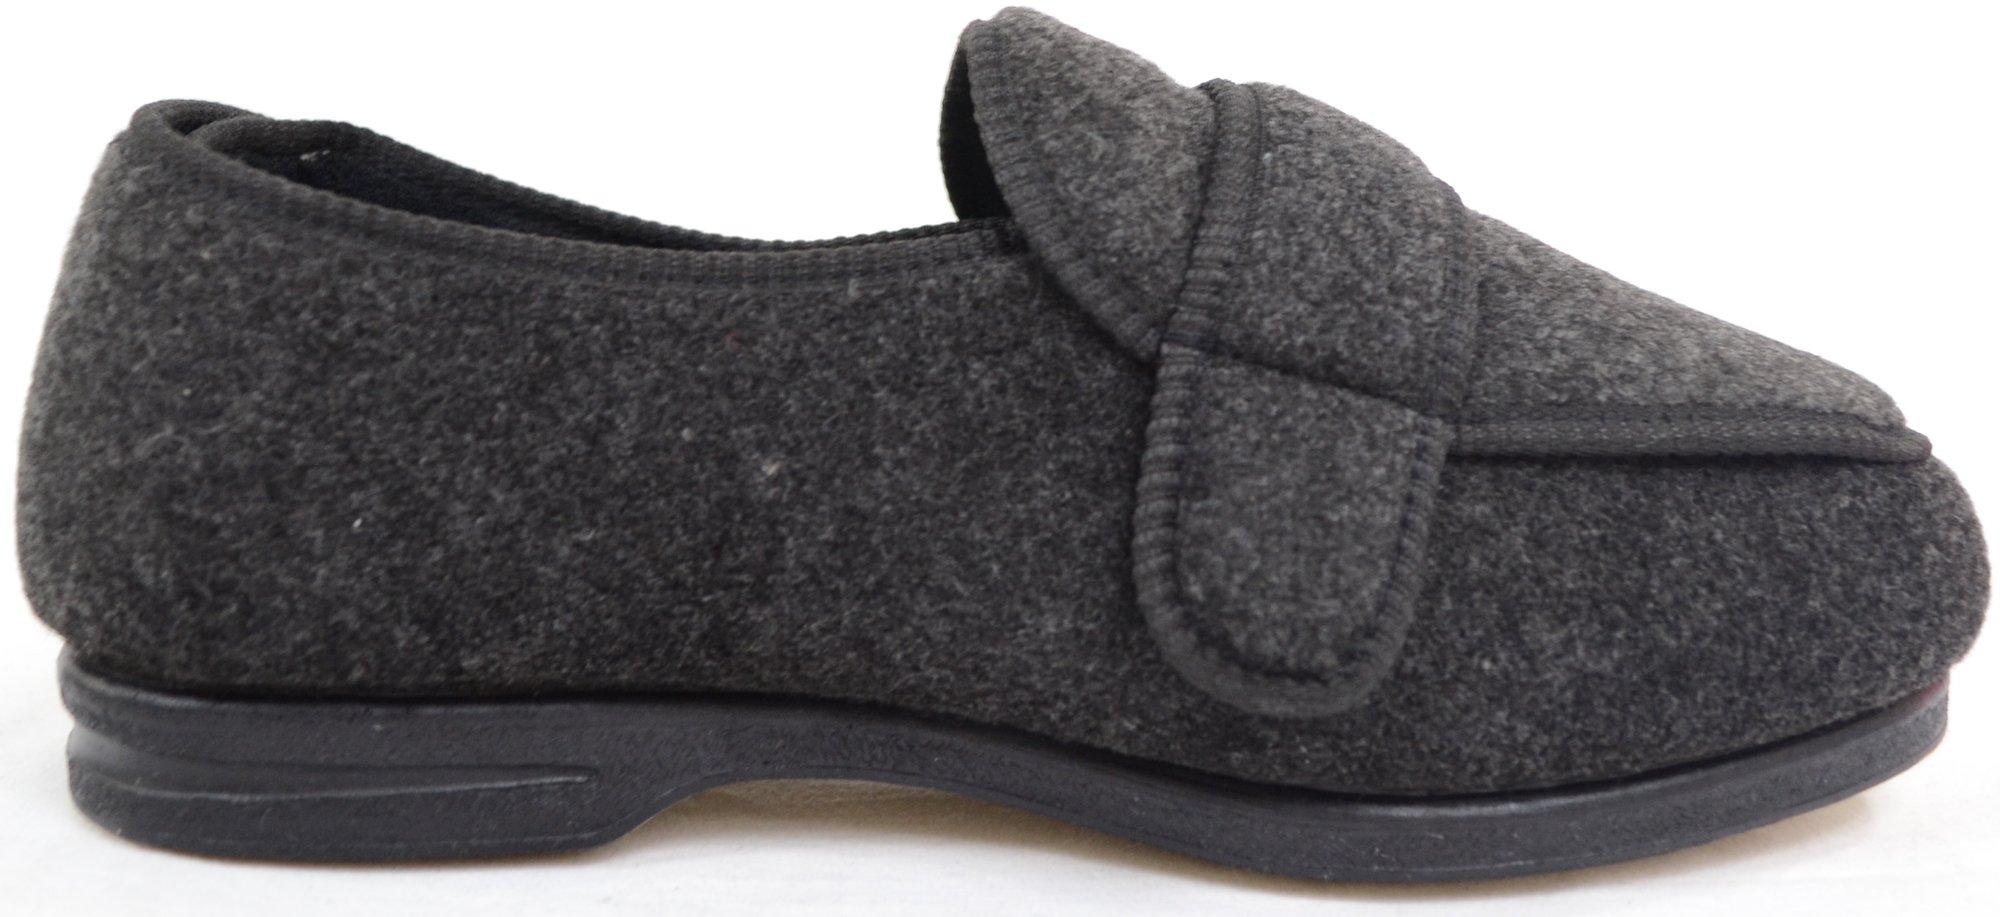 ABSOLUTE FOOTWEAR Mens Orthopaedic/Extra Wide Fit Adjustable Slipper Boot/Slippers - Grey - 10 US by ABSOLUTE FOOTWEAR (Image #4)